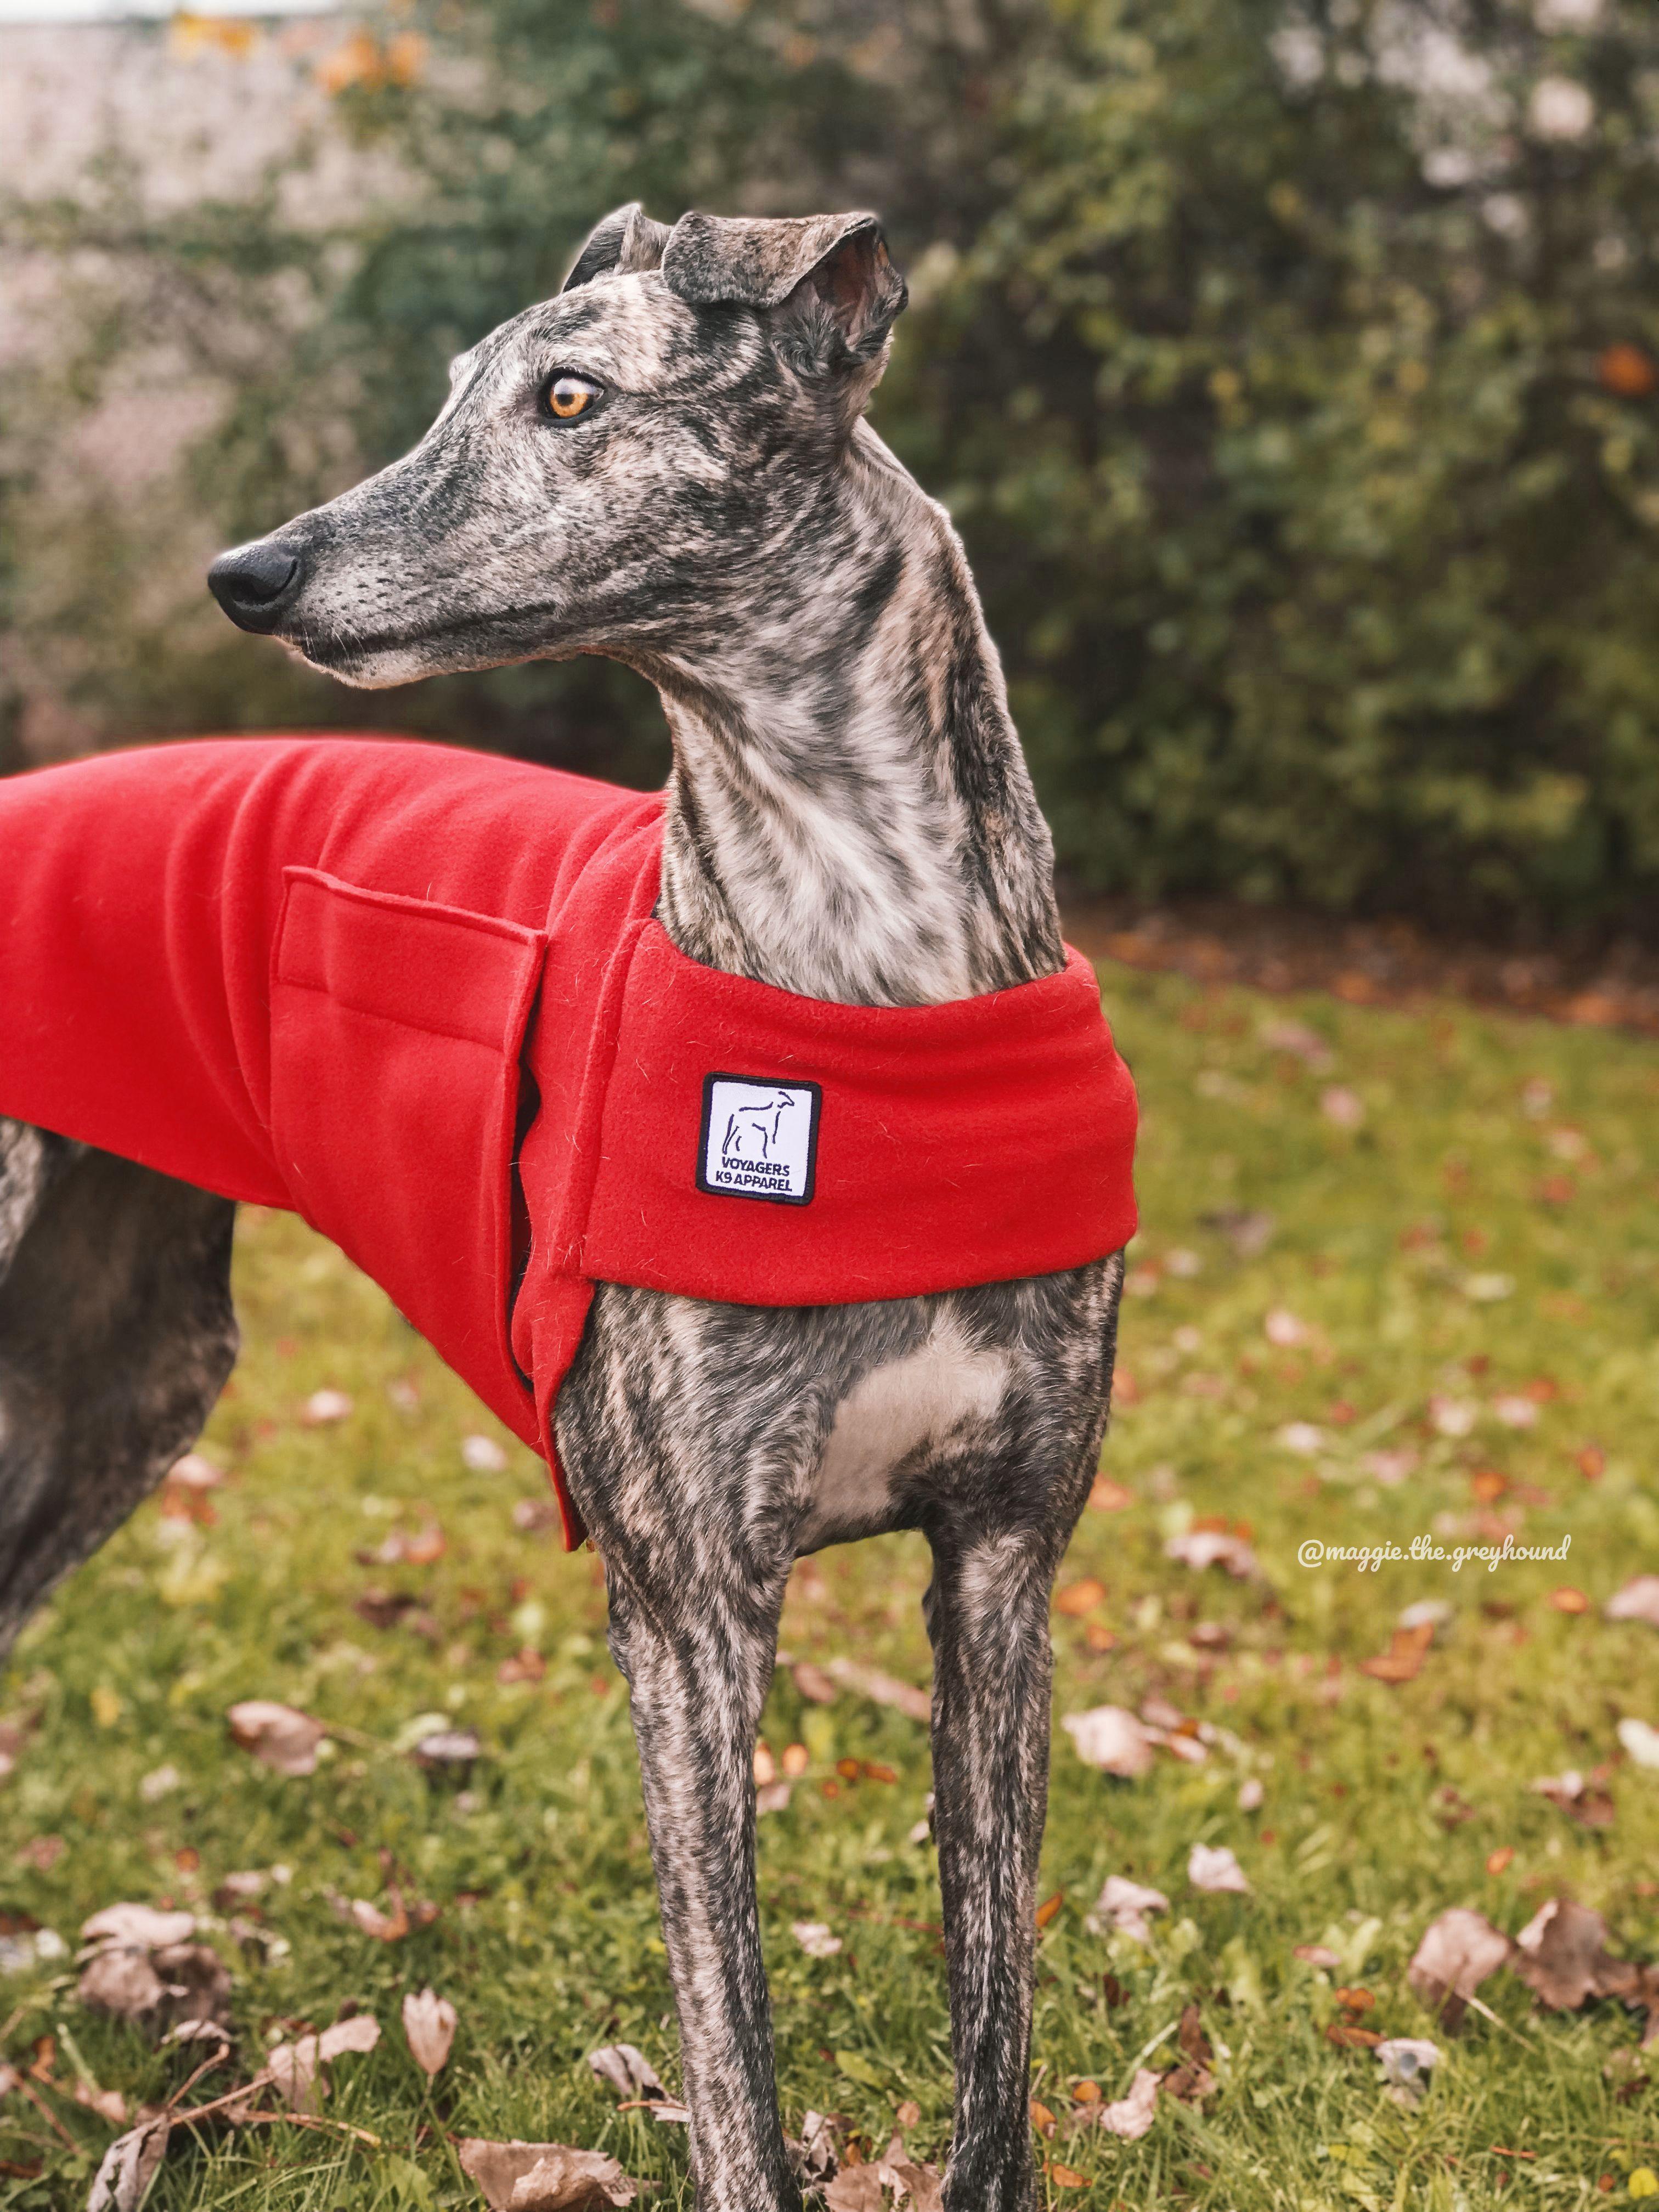 412565fbe8bdd Voyagers K9 Apparel Red Tummy Warmer Maggie the Greyhound Dog ...